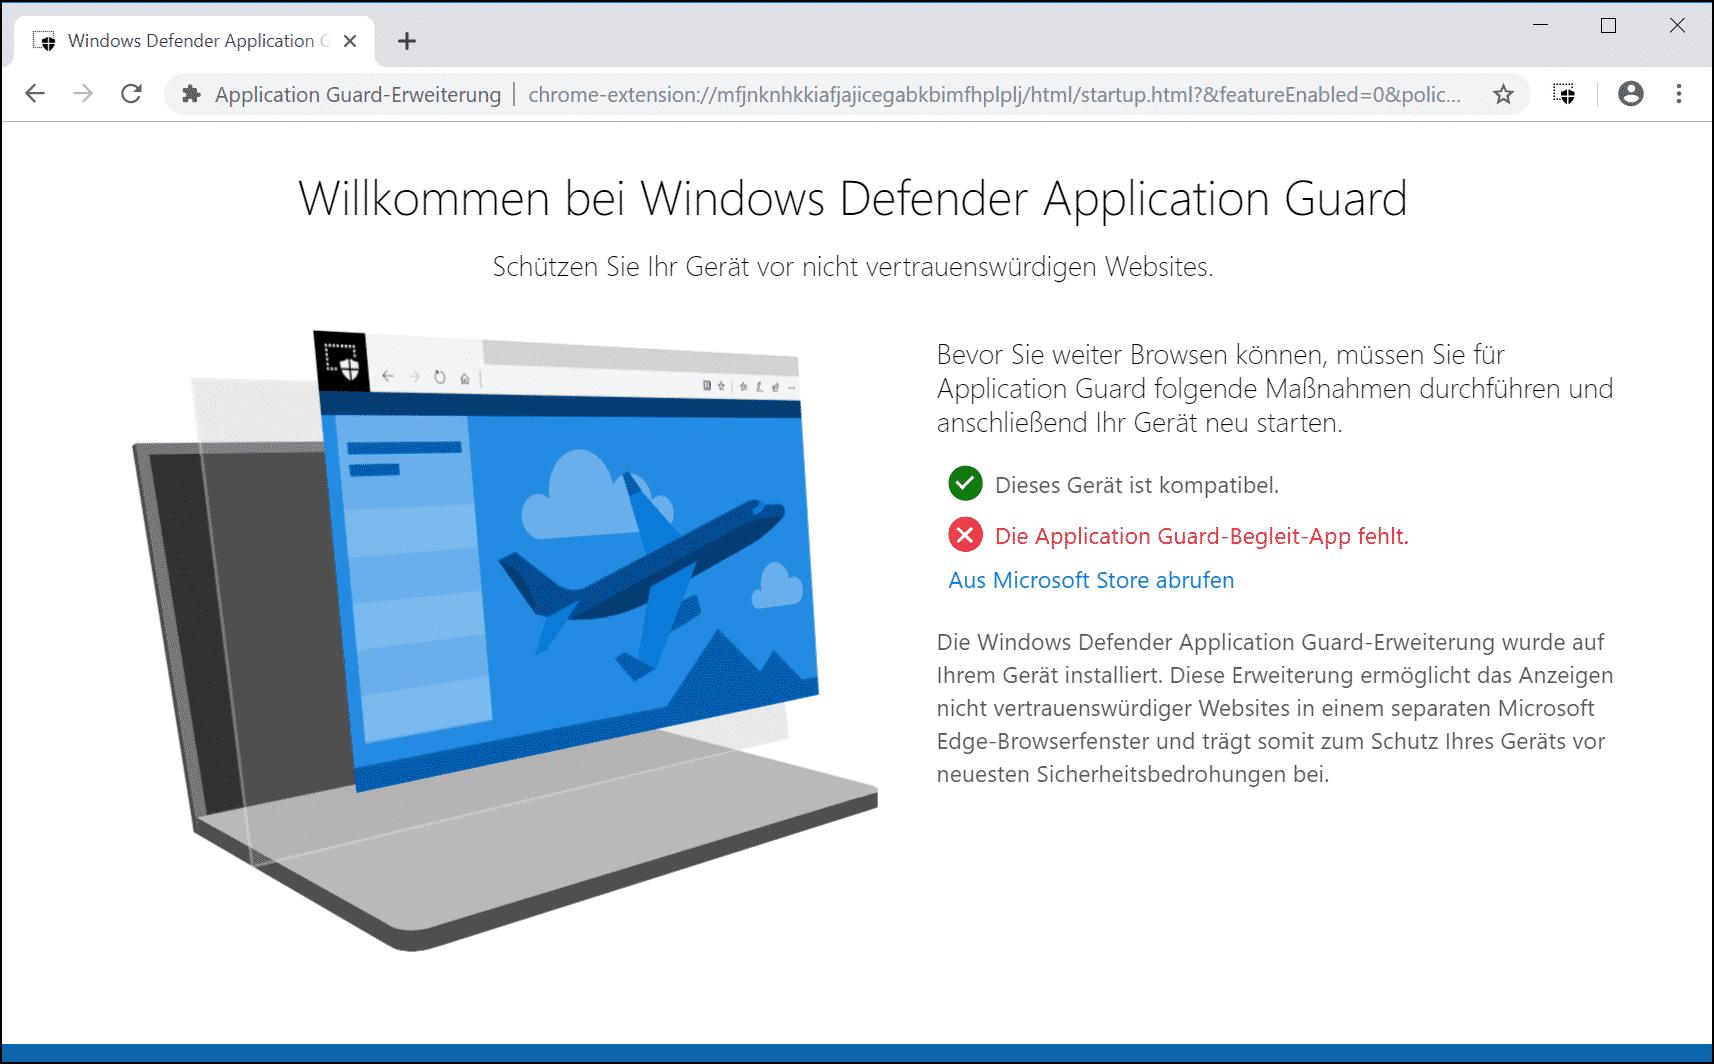 Willkommen bei Windows Defender Application Guard - Begleit App fehlt